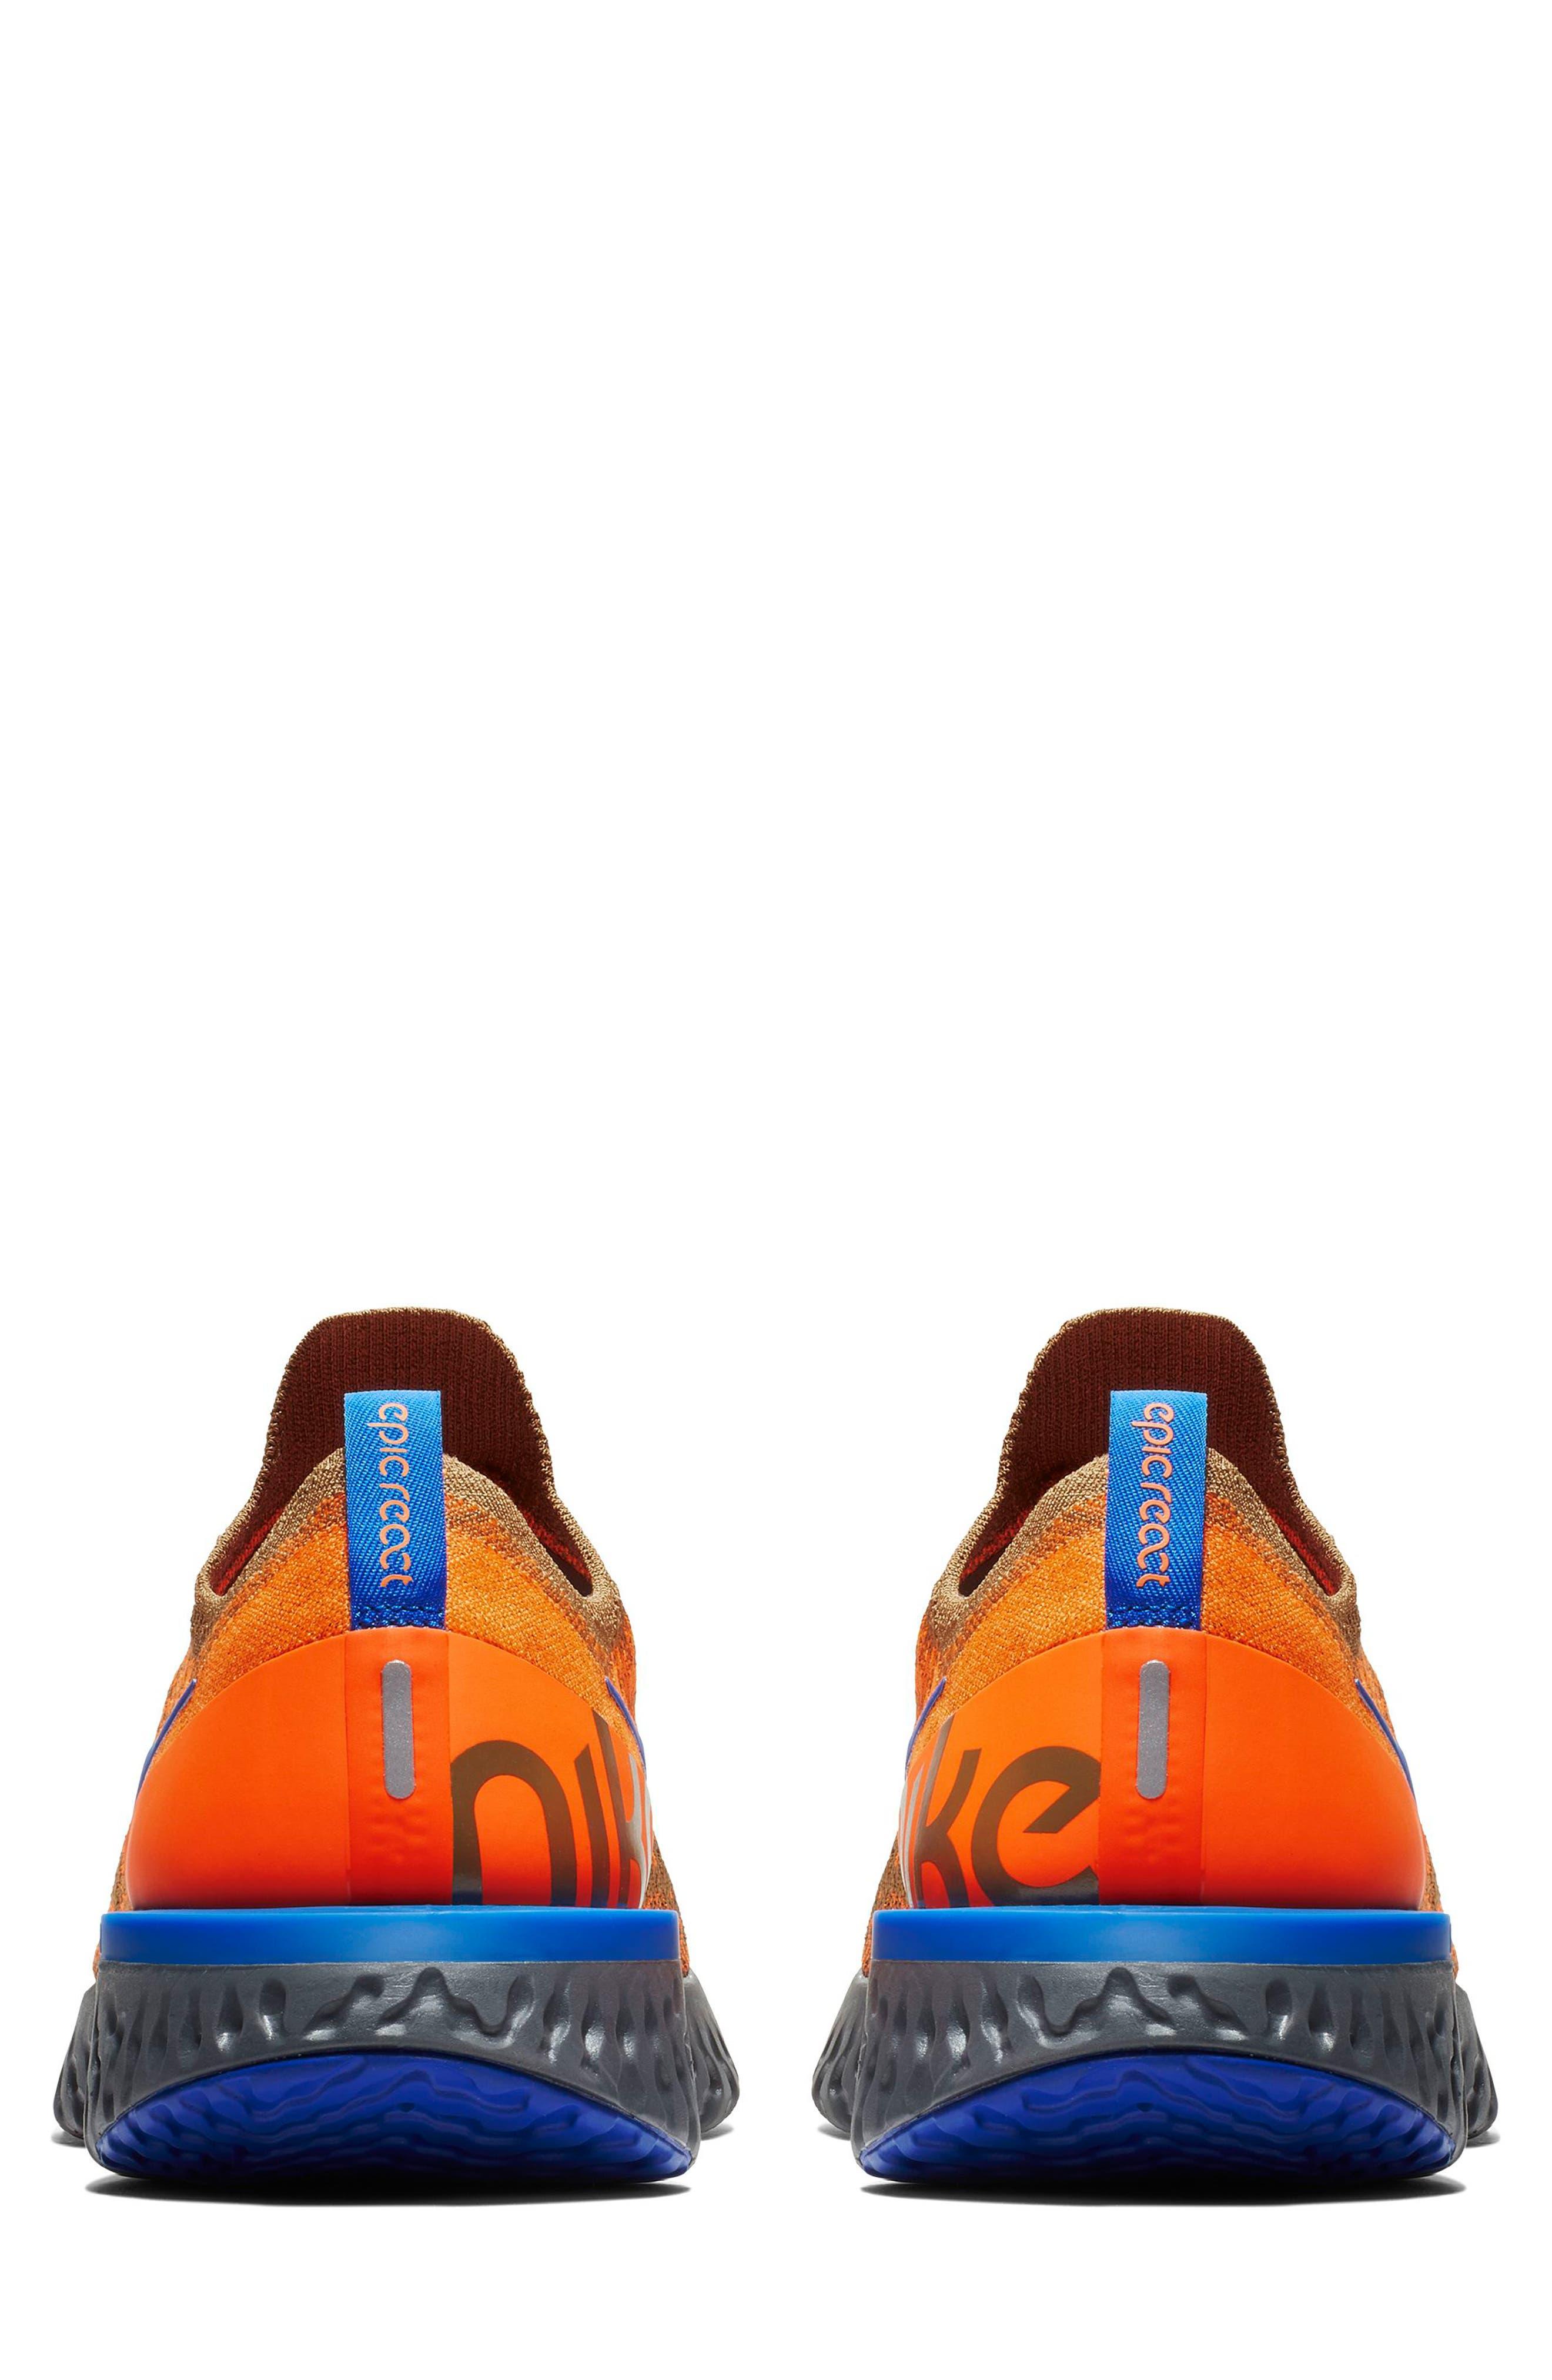 Epic React Flyknit Running Shoe,                             Alternate thumbnail 5, color,                             GOLDEN BEIGE/ BLUE/ ORANGE